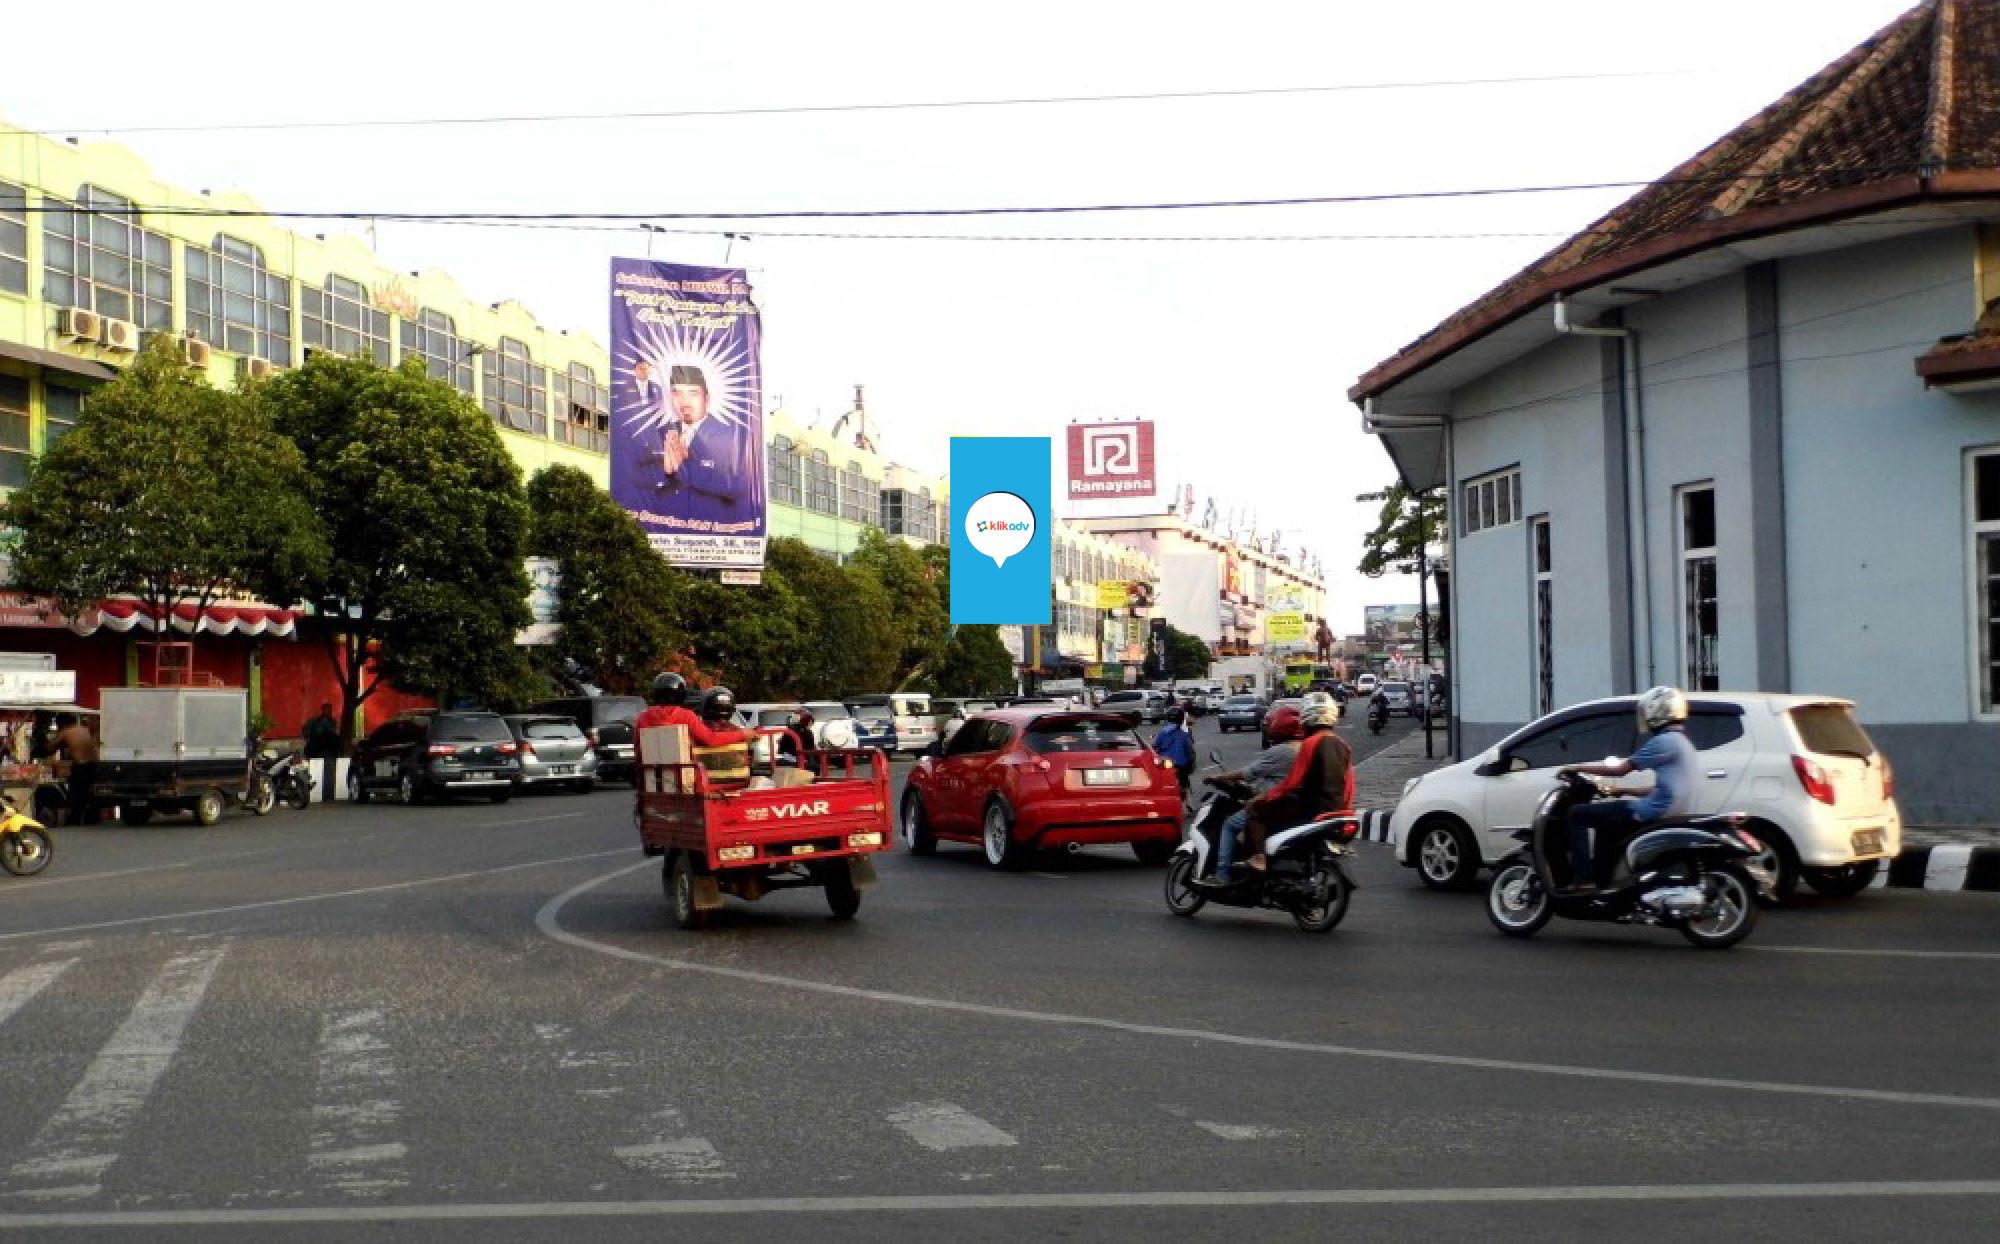 Sewa Billboard Lampung Kota Bandar Jl Raden Intan 006 Bb